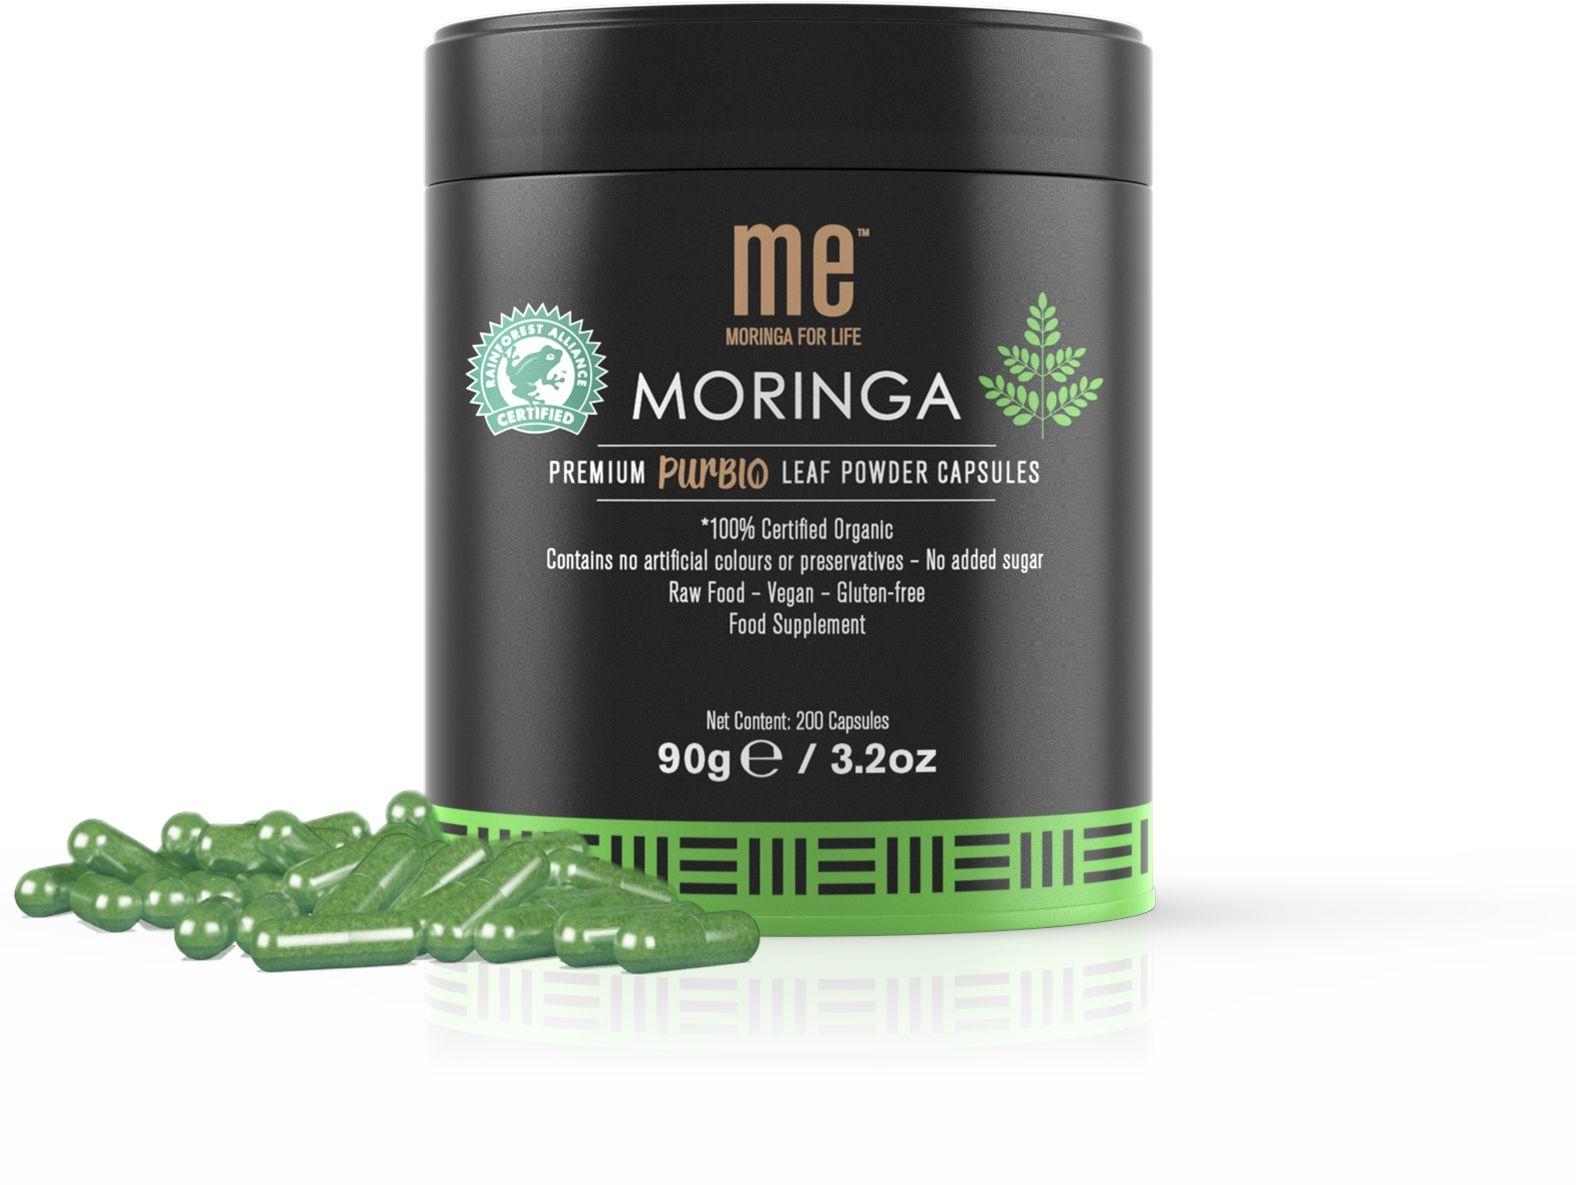 Me moringa moringa leaf powder capsules 200 capsules for Buy slimming world products online